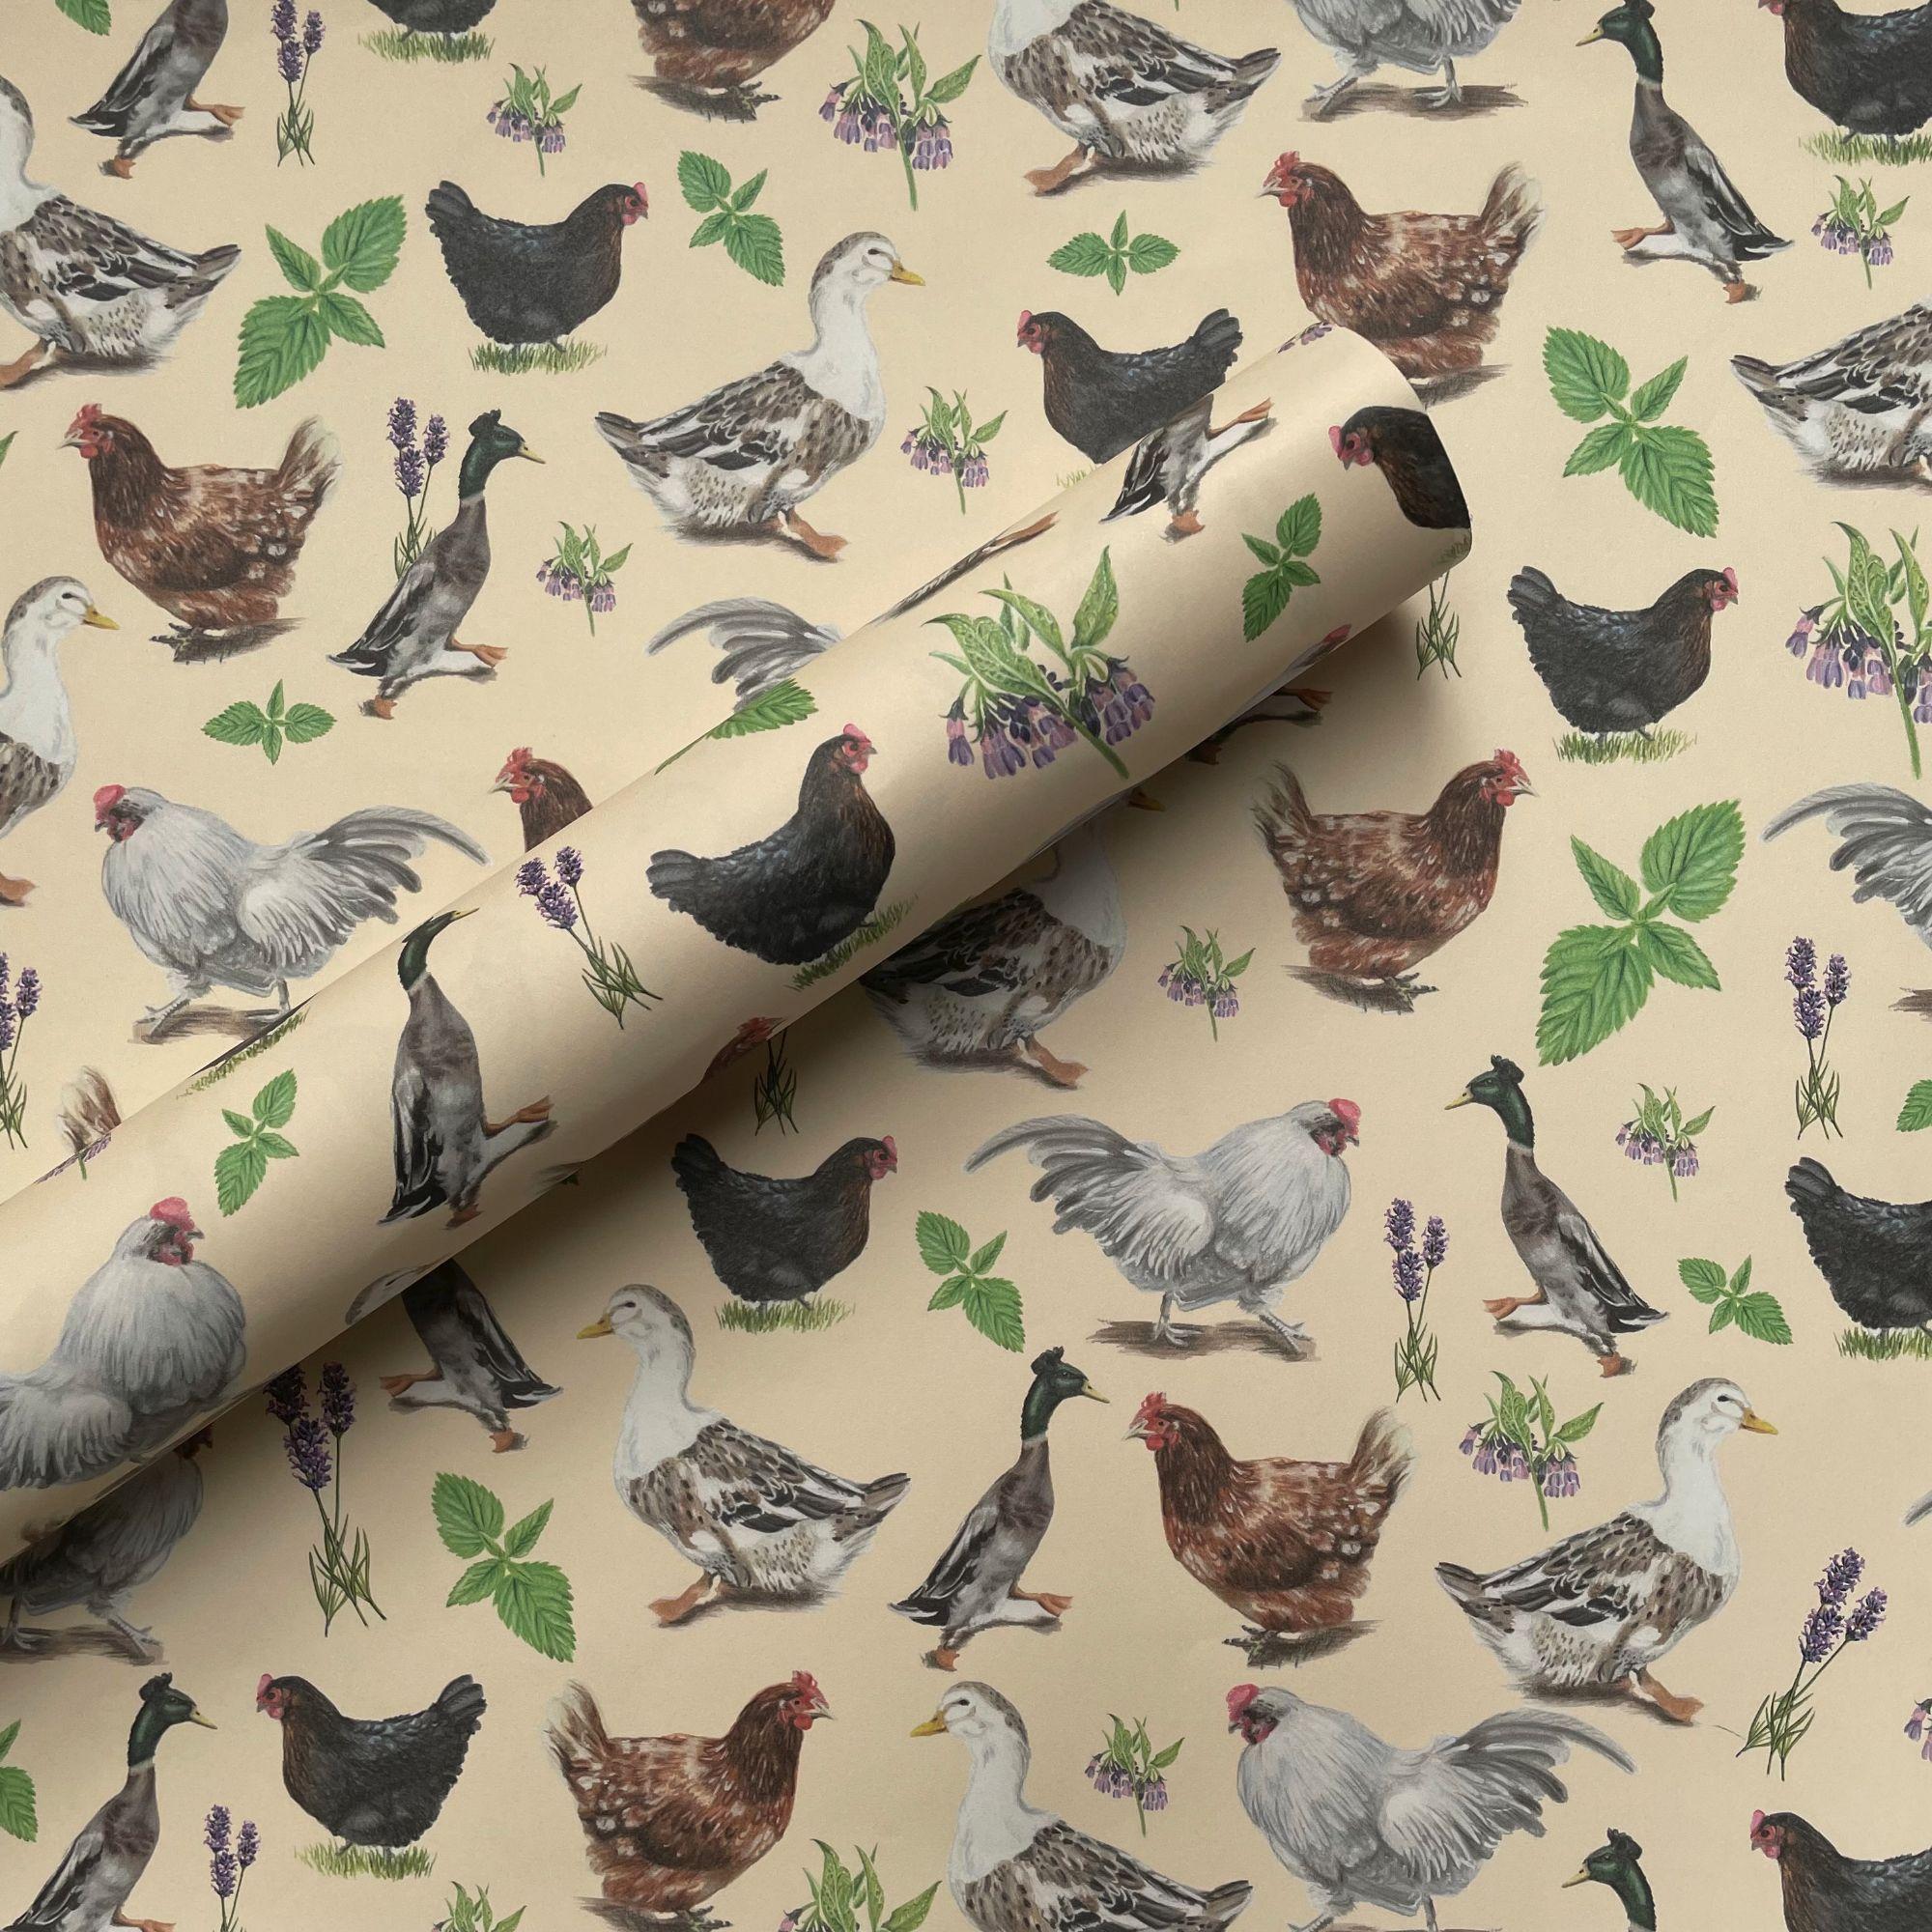 Chooks and Ducks.jpg